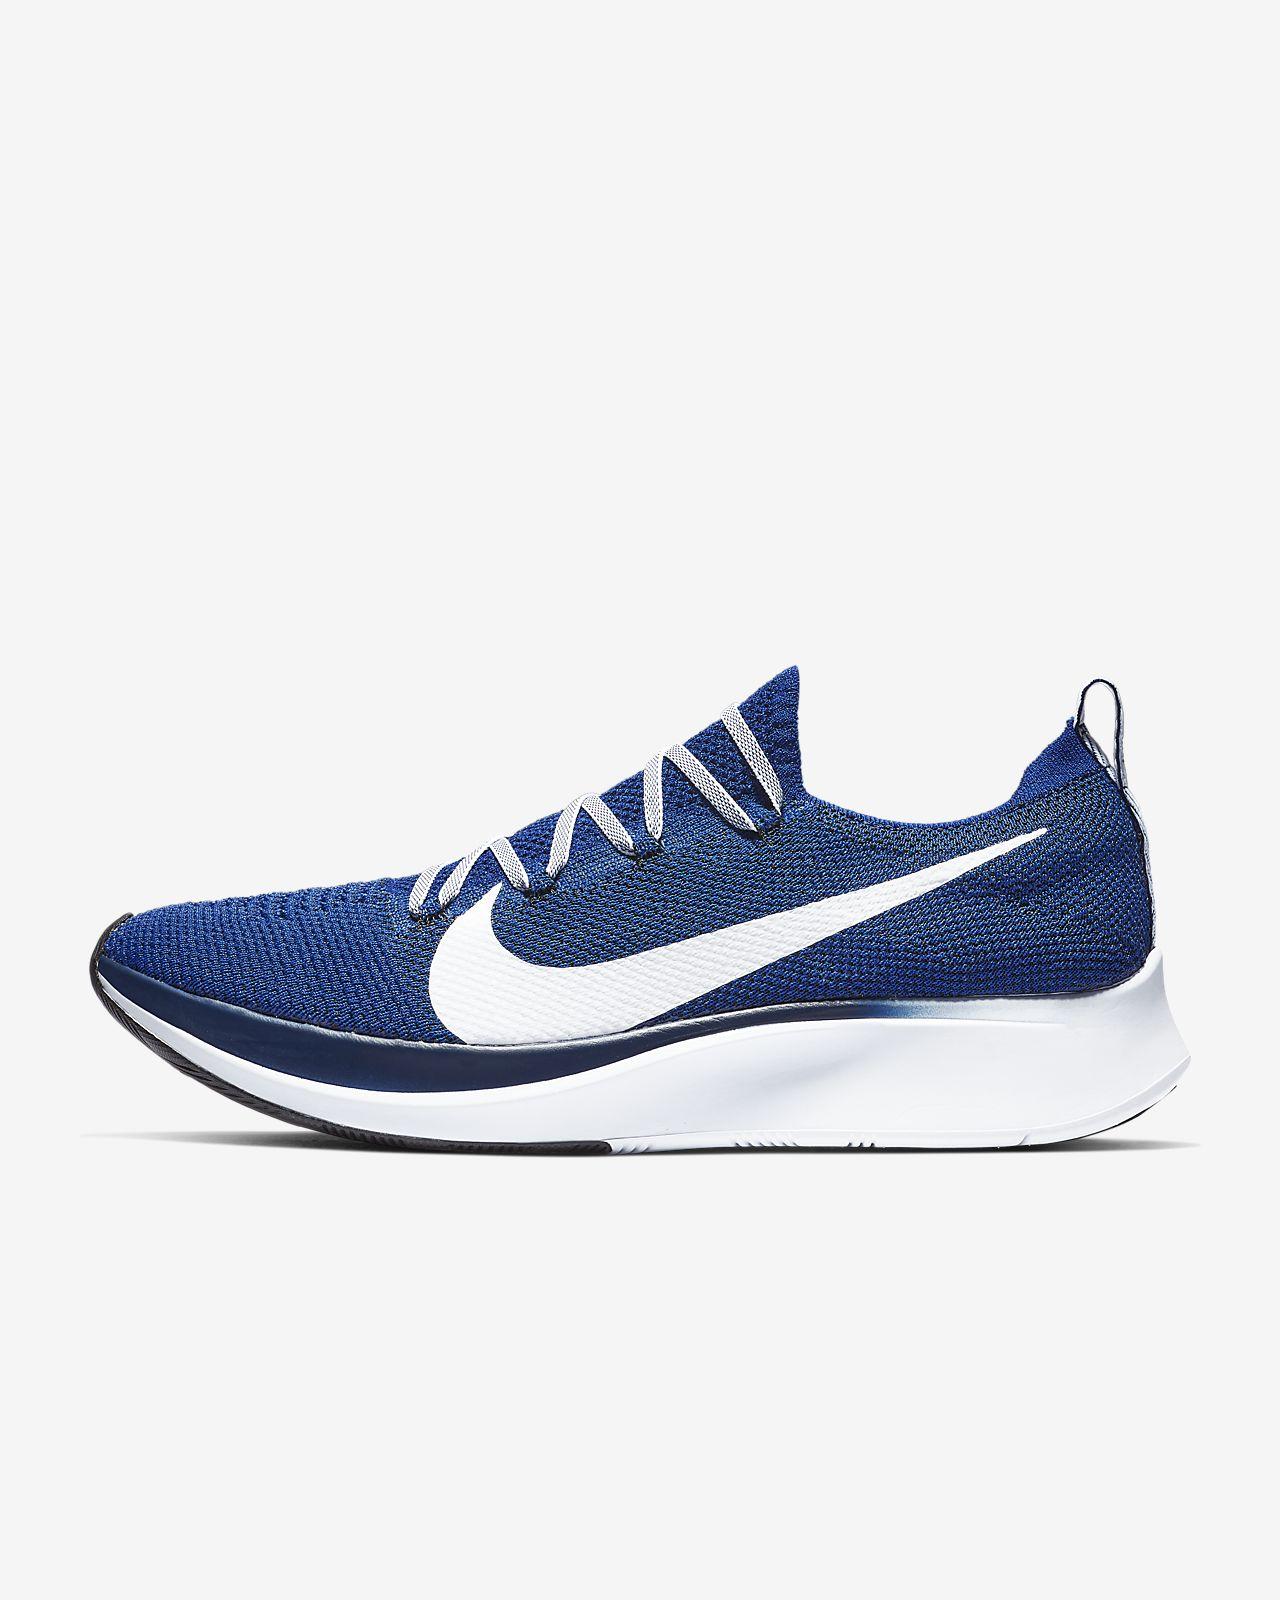 the latest dfe14 3bc46 Nike Zoom Fly Flyknit Zapatillas de running - Hombre